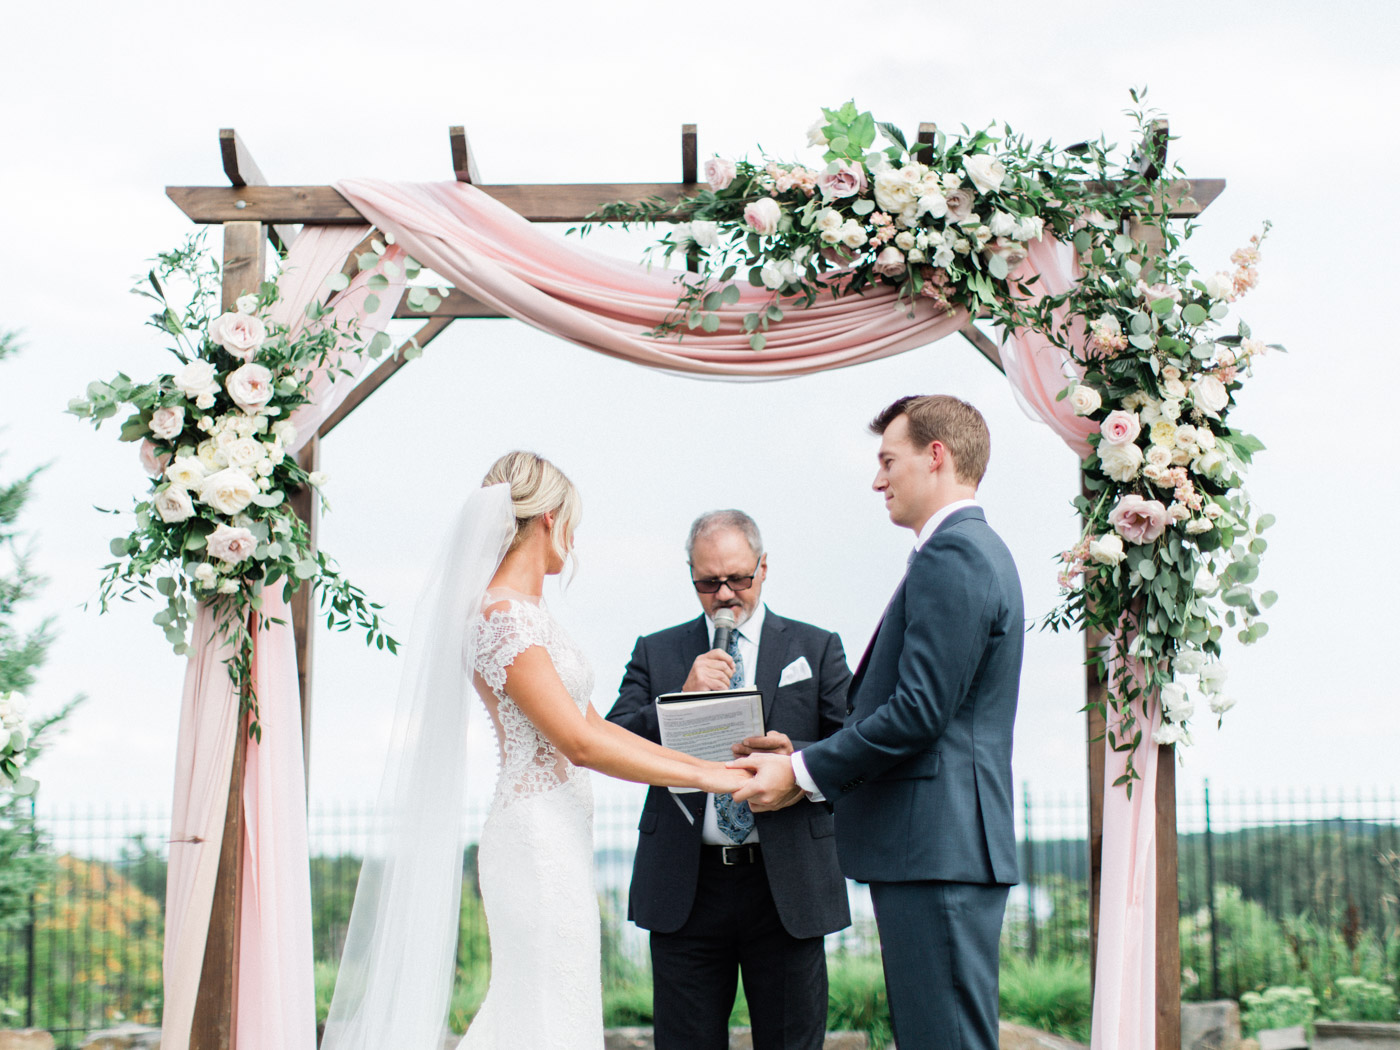 Toronto-Muskoka-wedding-photographer-summery-fun-documentary-the-marriott-rosseau81.jpg